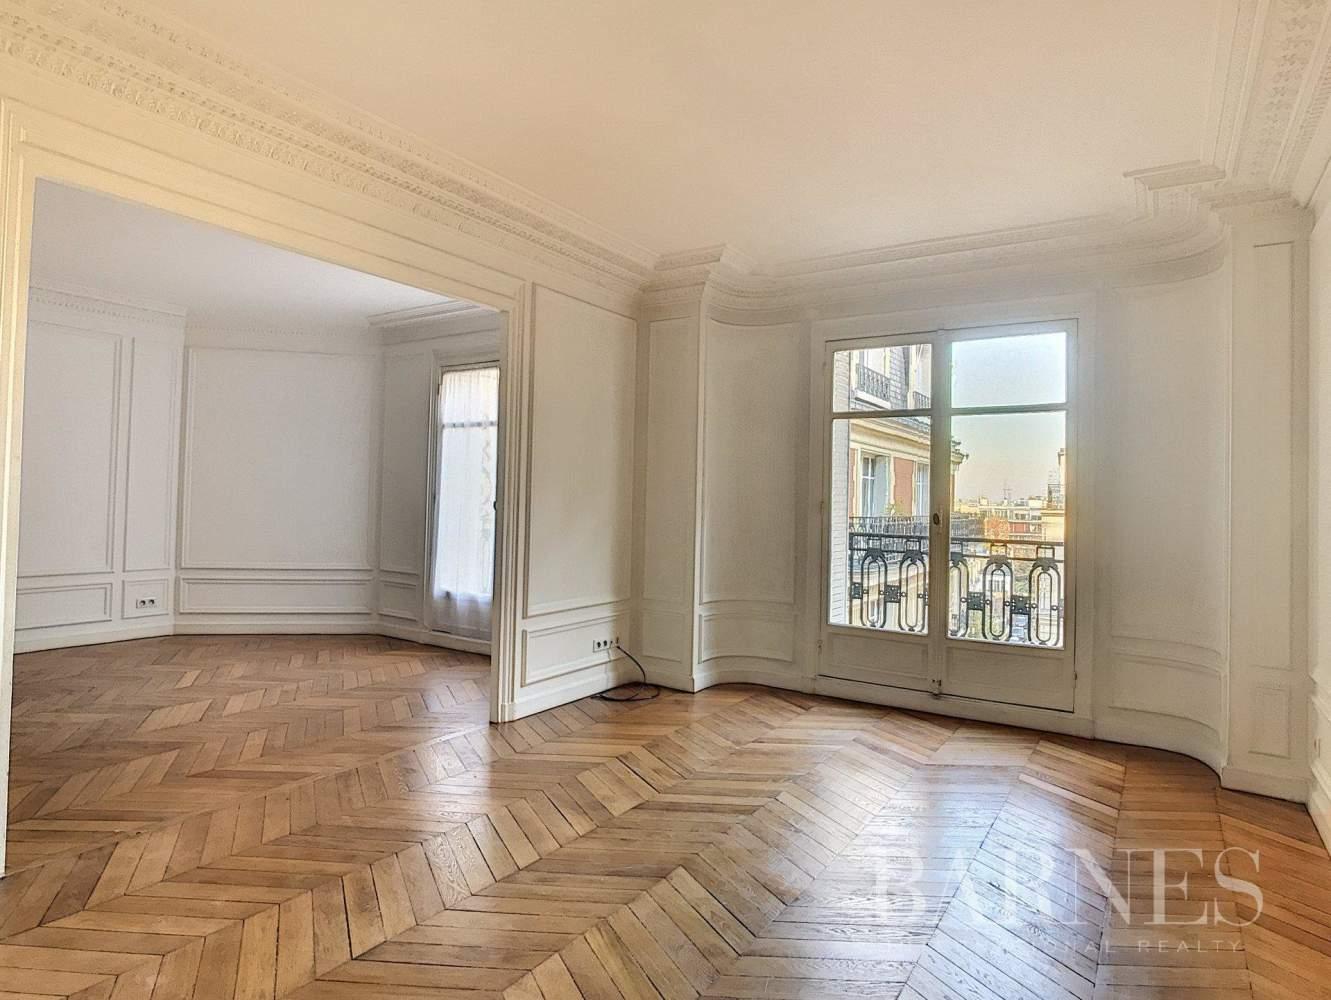 Neuilly-sur-Seine  - Appartement 5 Pièces - picture 2